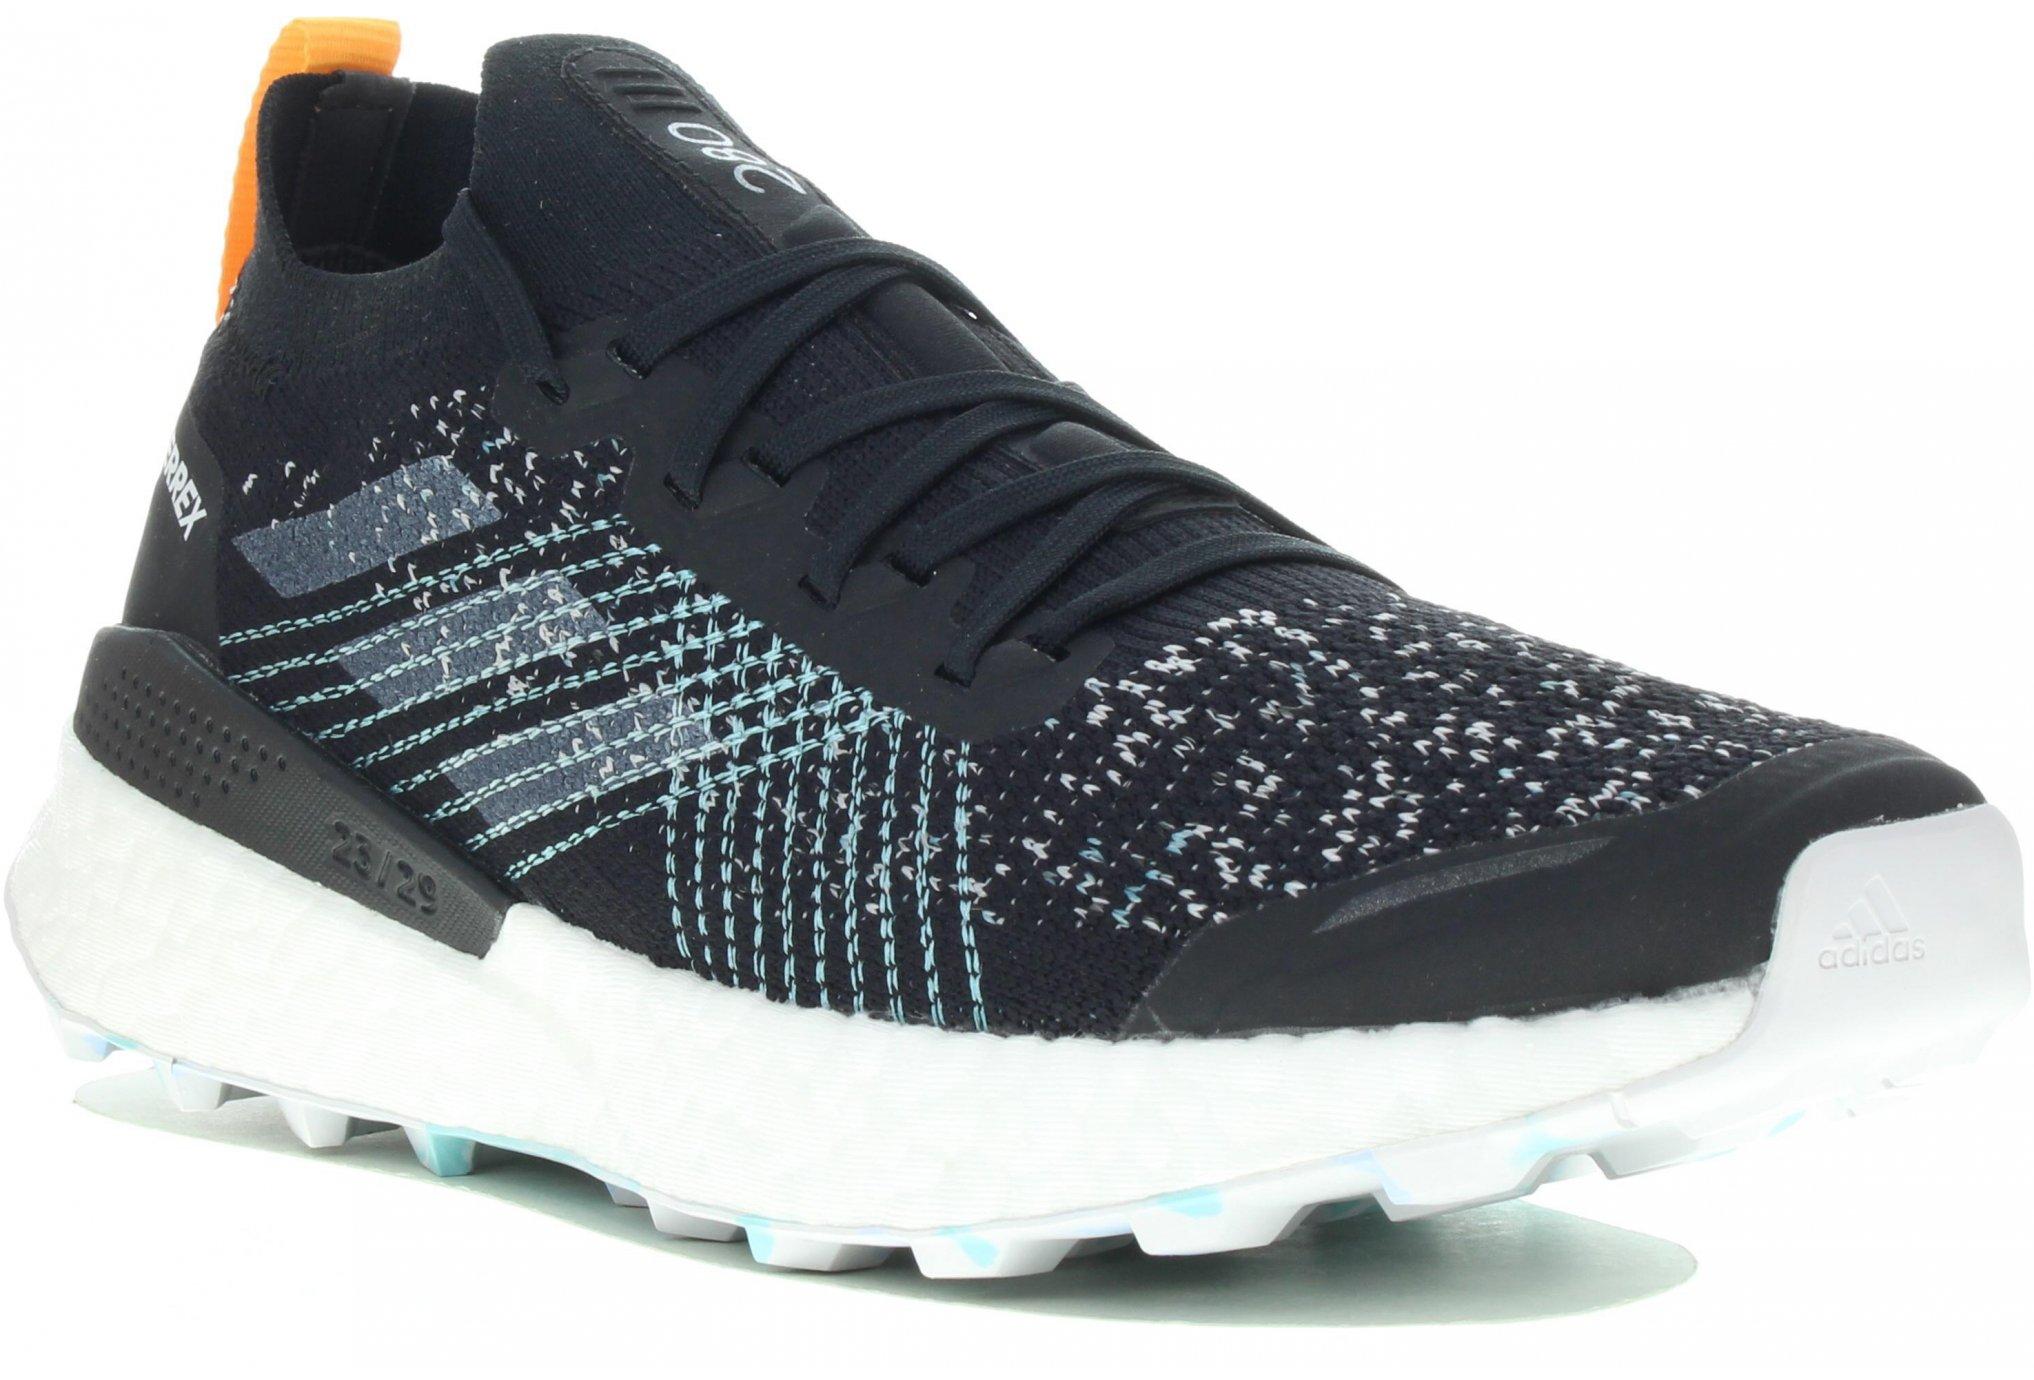 adidas Terrex Two Ultra Parley Chaussures running femme